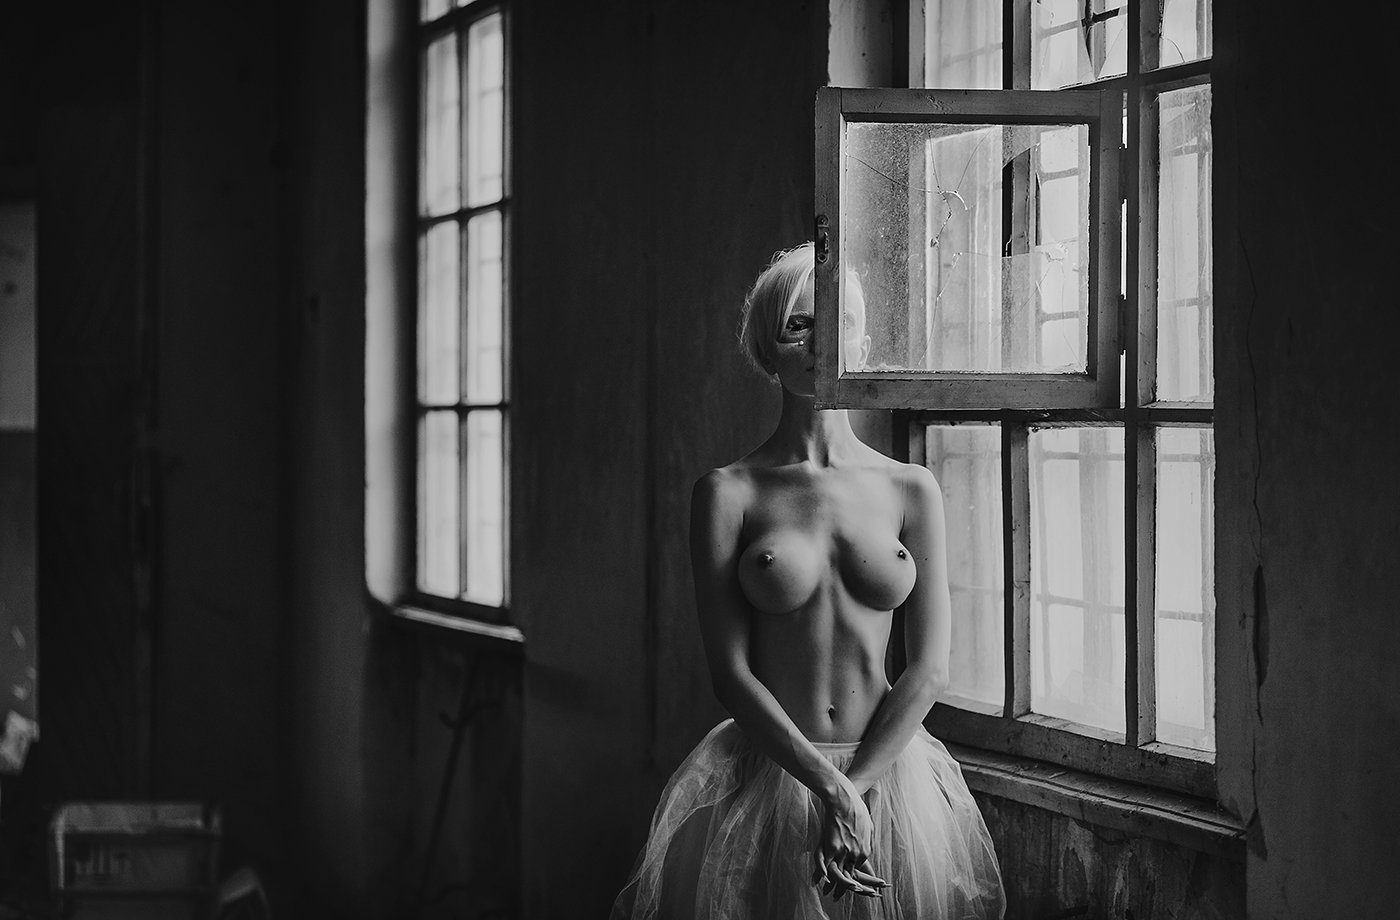 портрет,модель,путешествия,монохром,ню,обнажённая натура,аркадий курта, Курта Аркадий